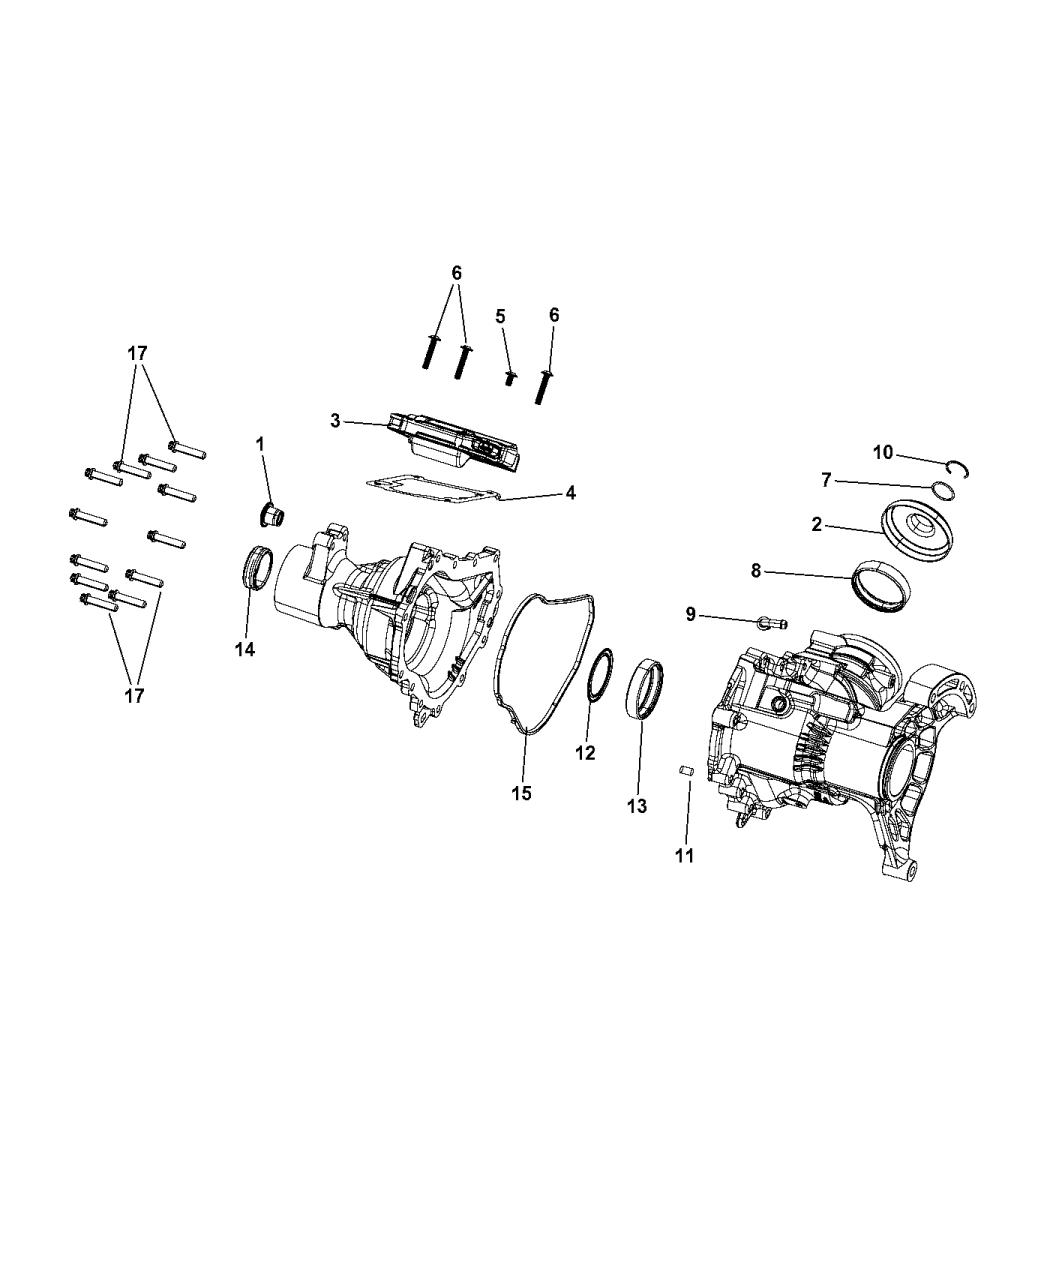 2015 Chrysler 200 Power Transfer Unit Service Parts